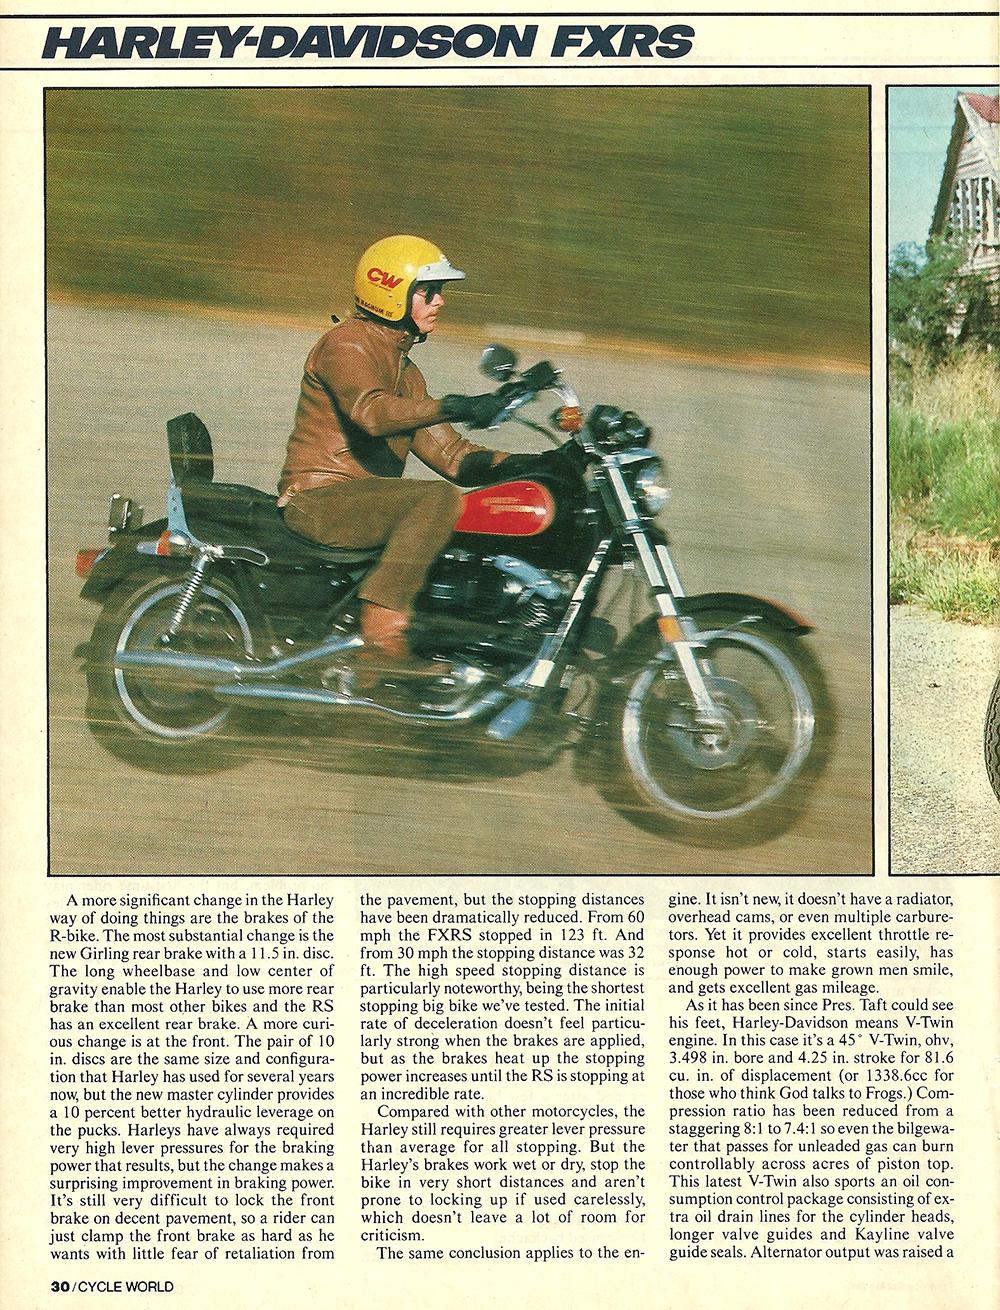 1981 Harley-Davidson FXRS road test 3.jpg